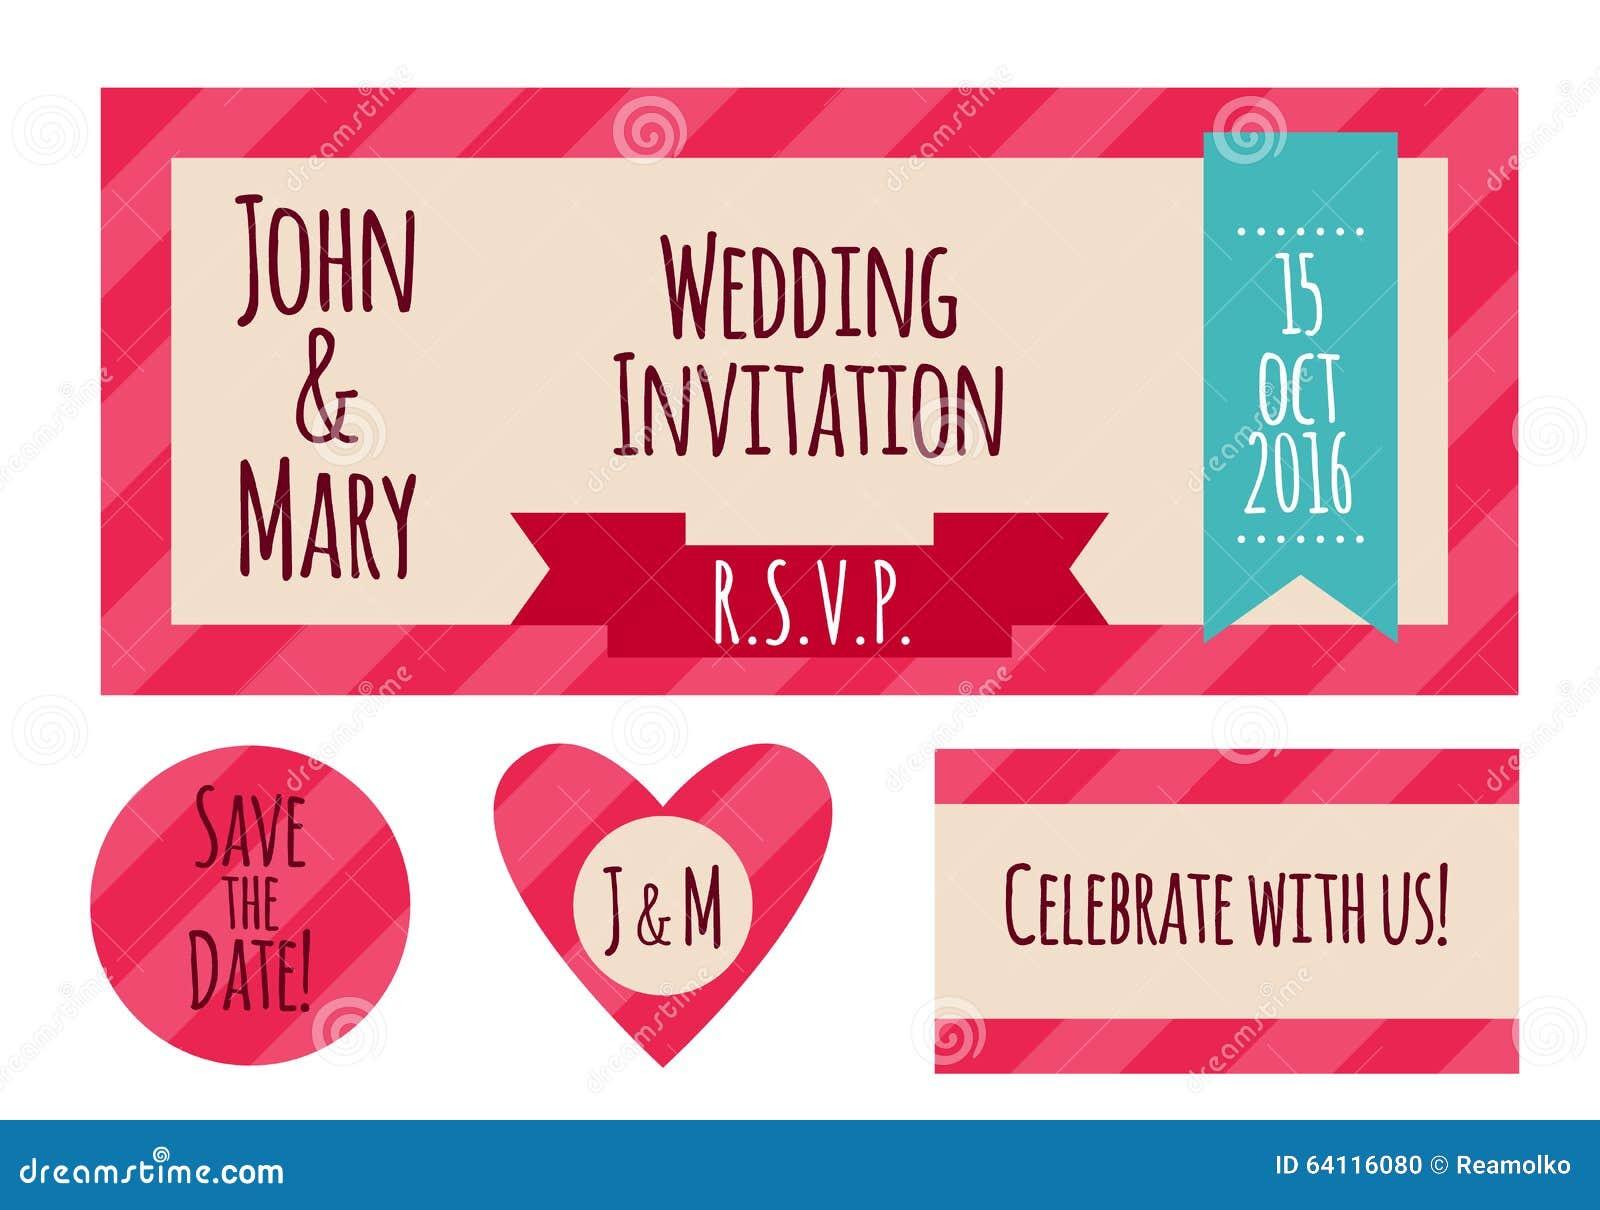 Wedding Invitation Card In Simple Style Stock Vector - Illustration ...